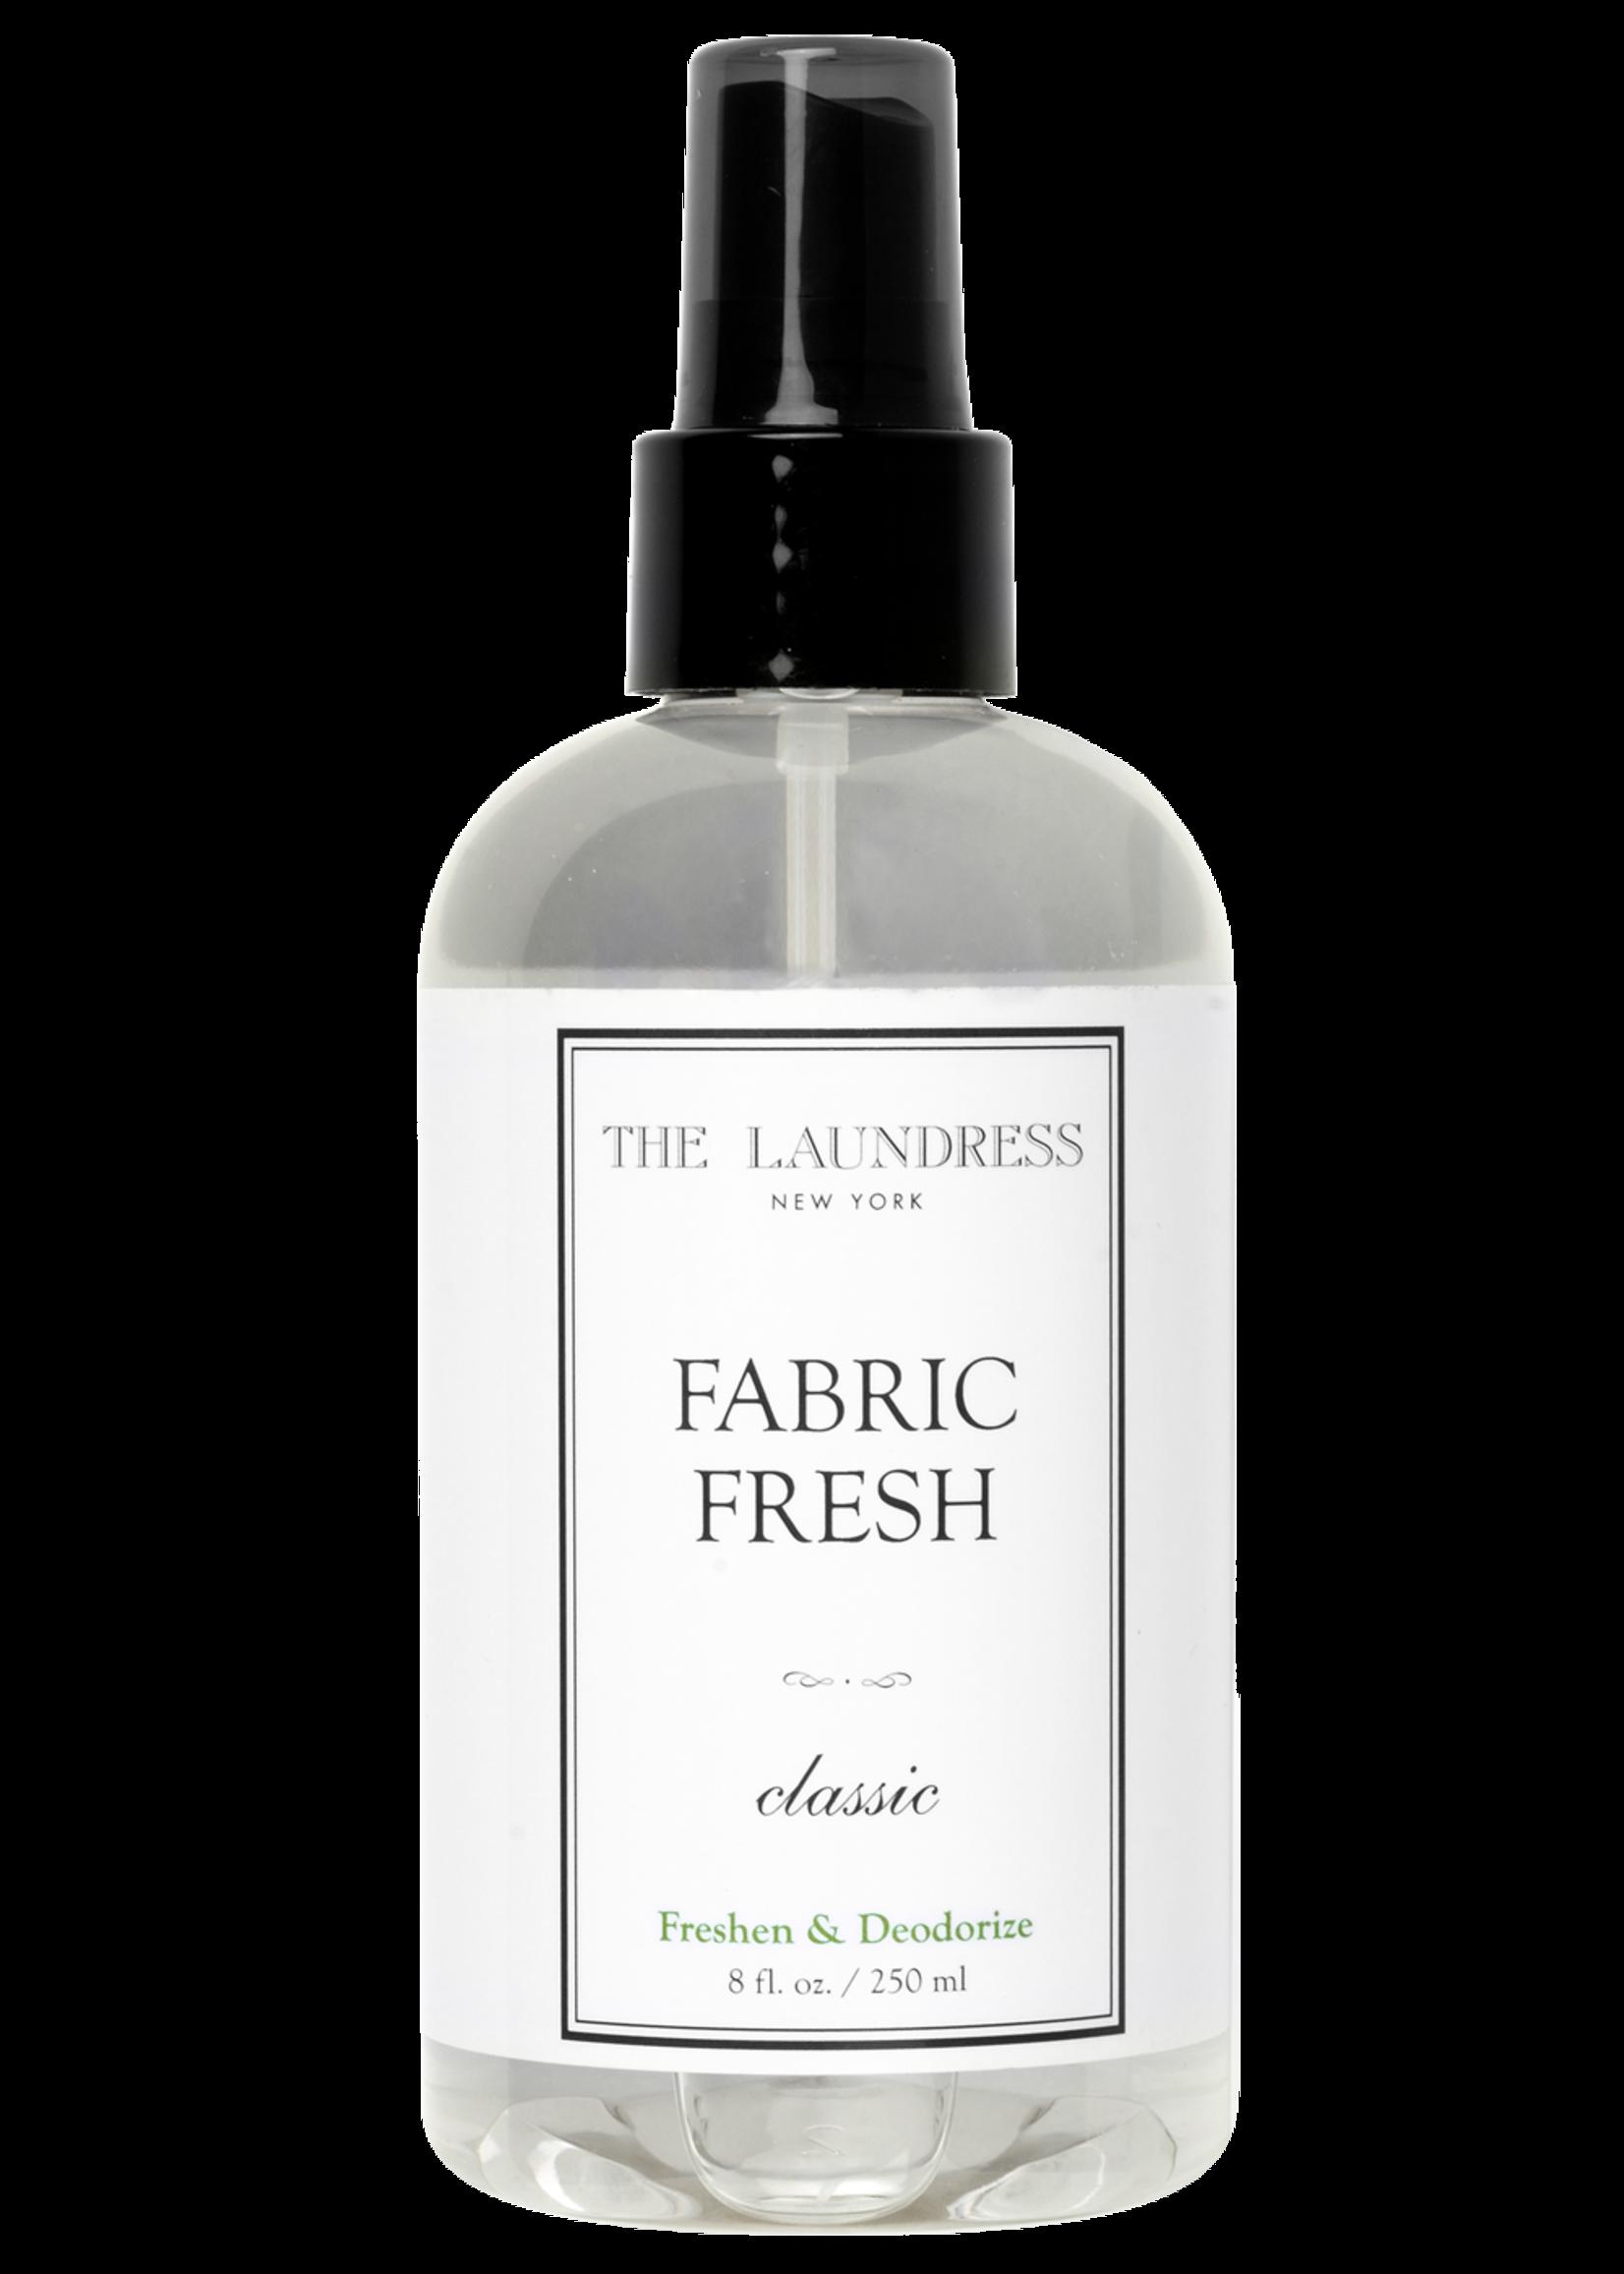 The Laundress New York Classic Fabric Fresh